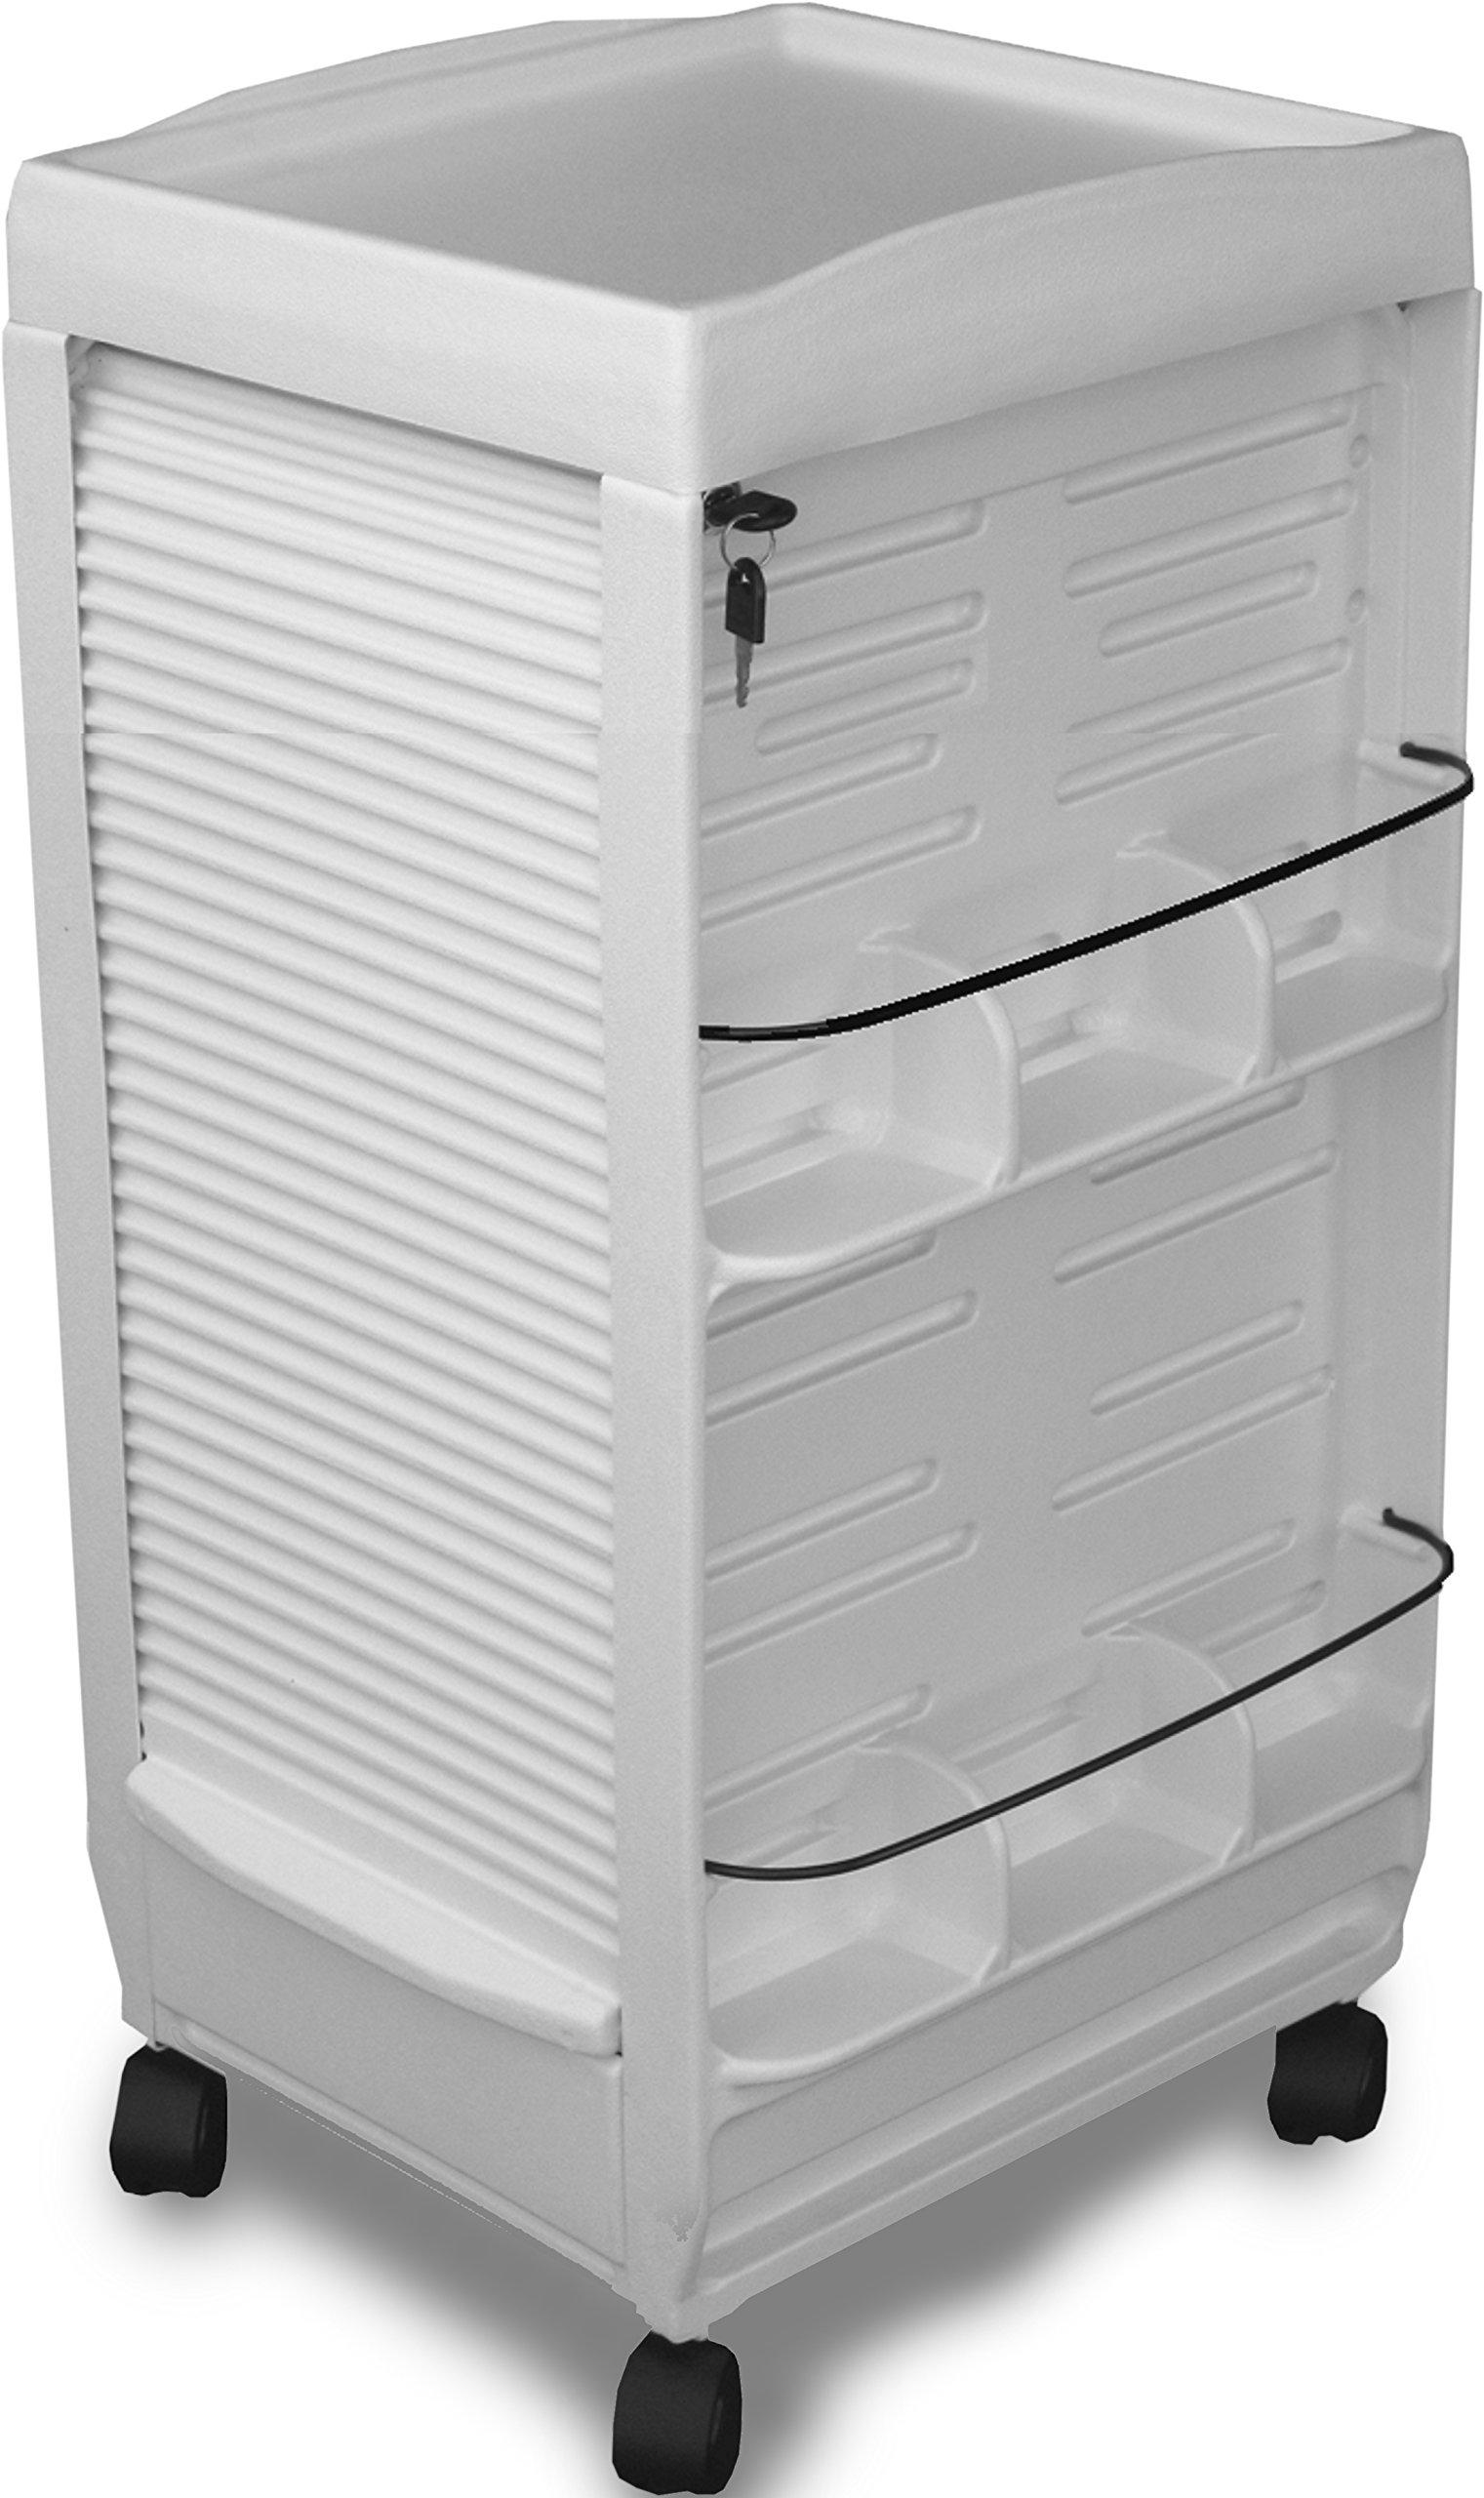 C185E Prime Medical Dental Mini Lockable White Cart 30''H Made in USA by Dina Meri